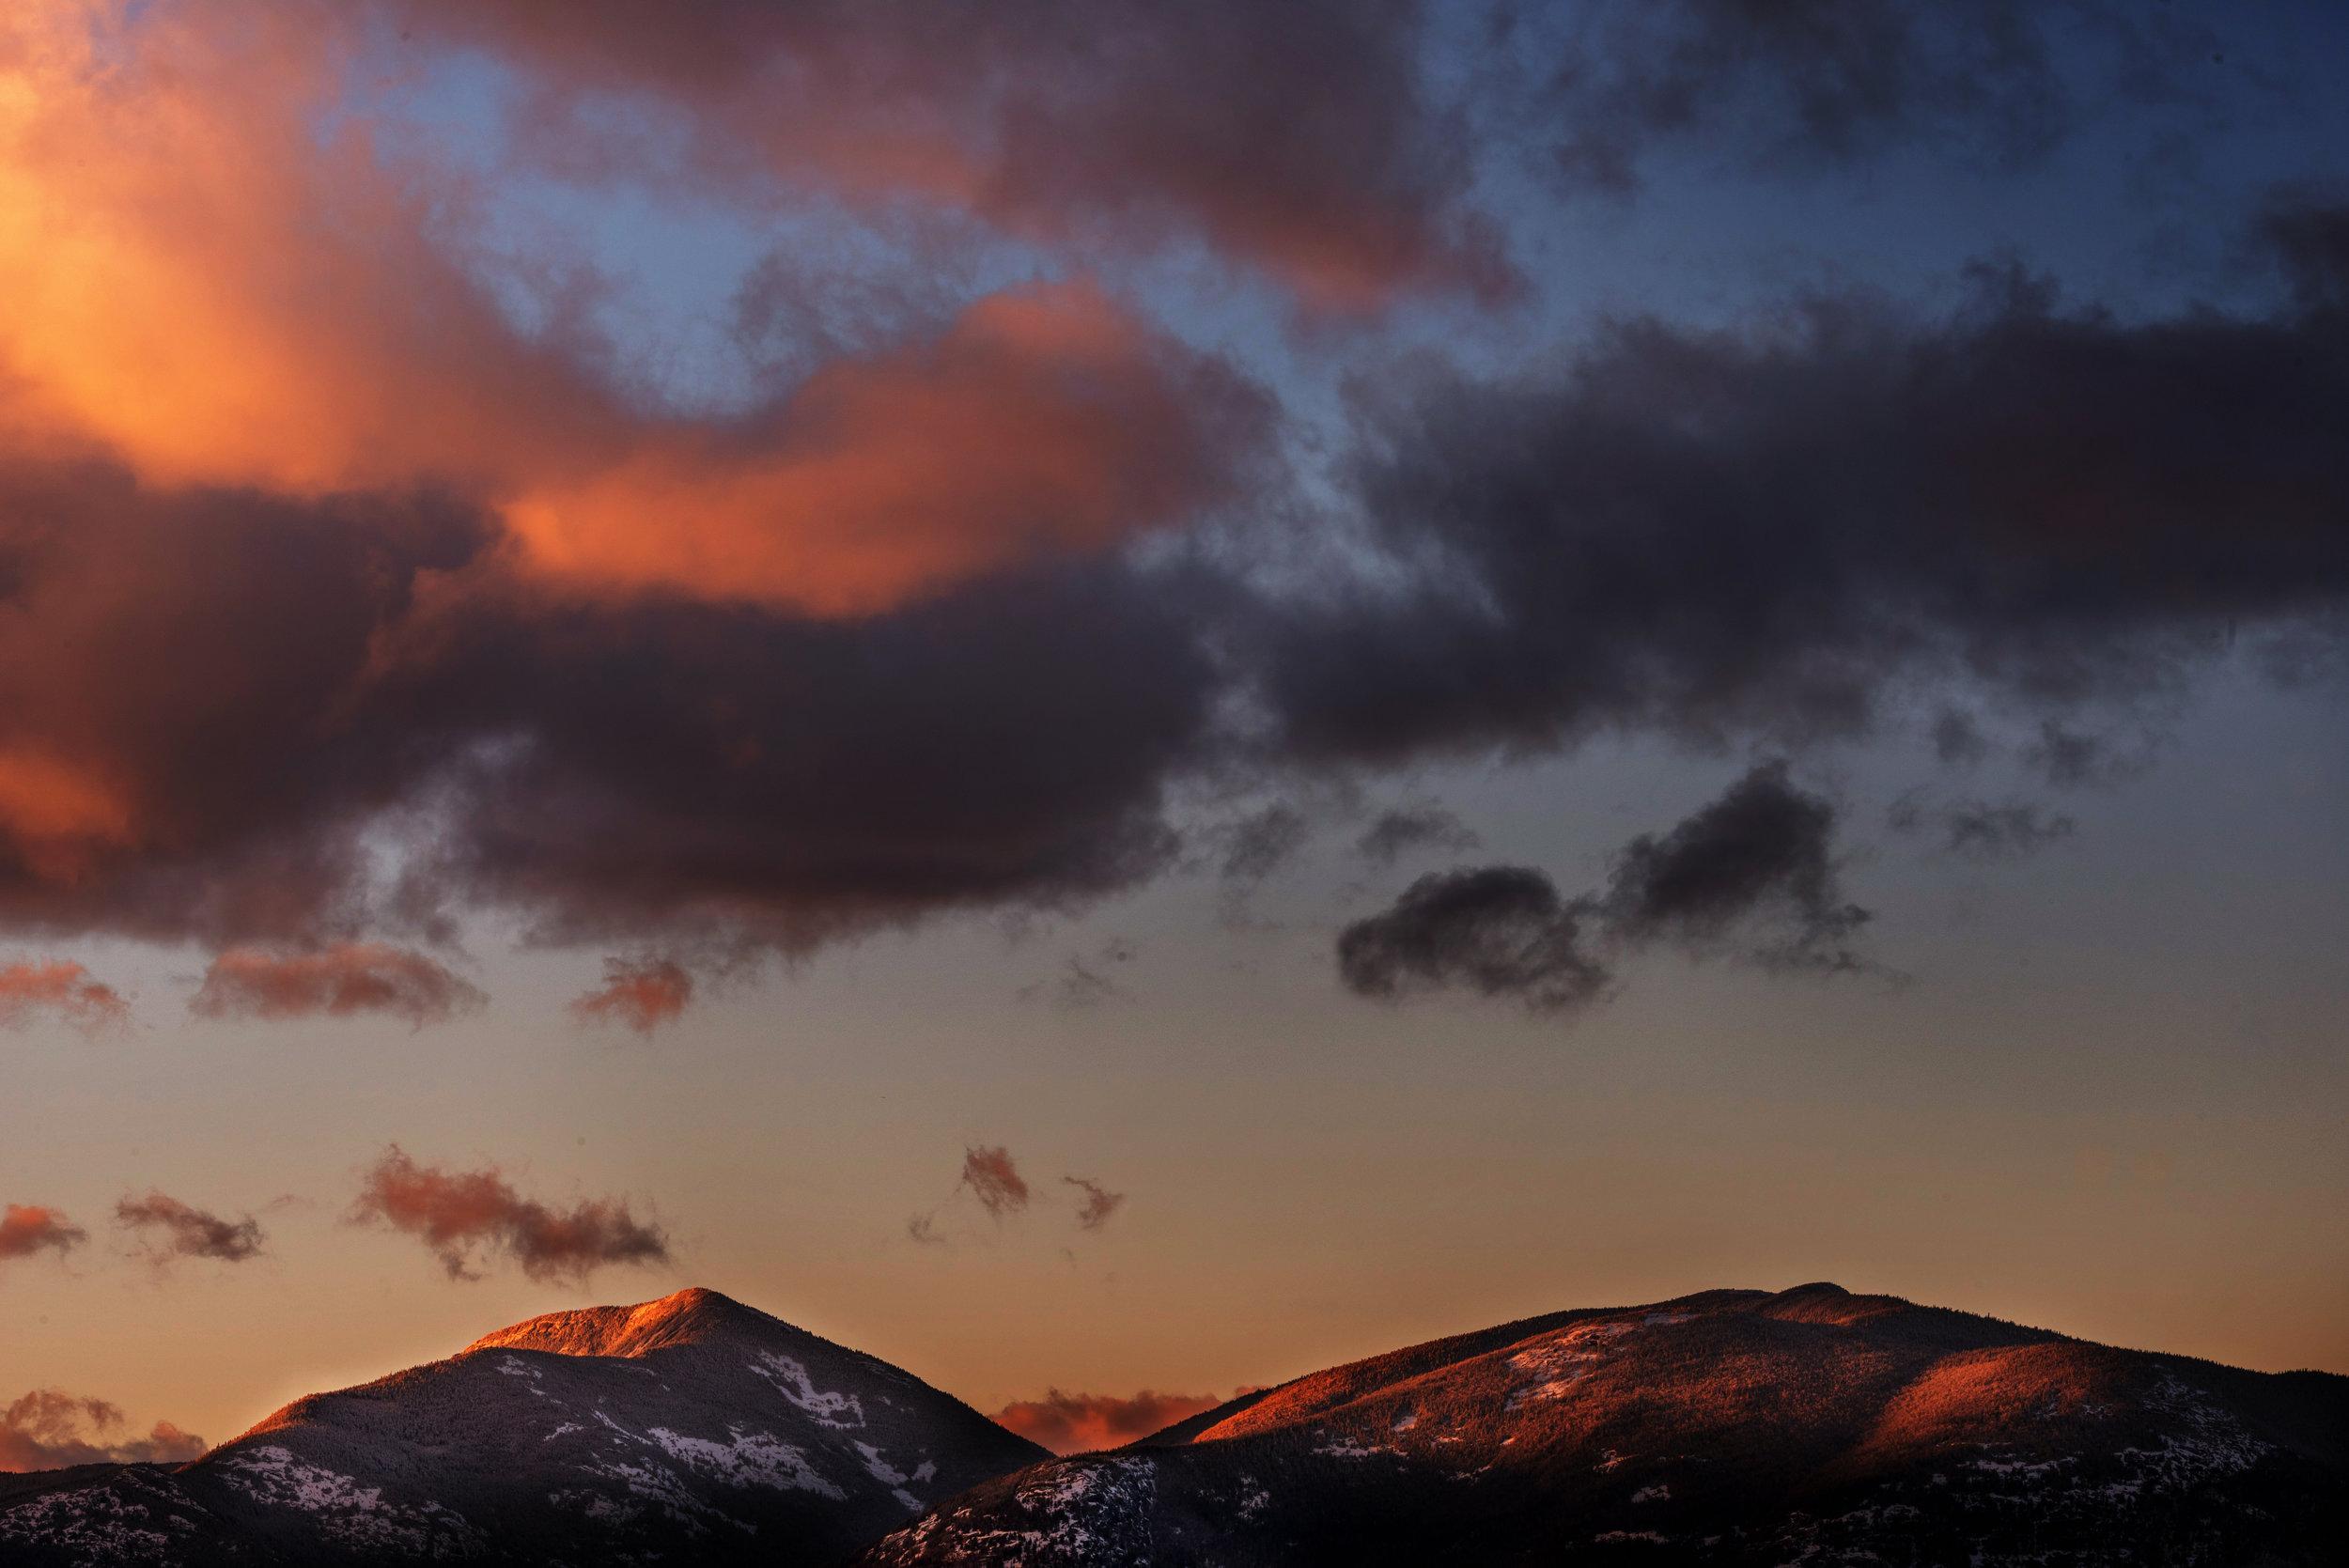 Open Edition #7 — Adirondack Winter Sunset - 12x18 - $45